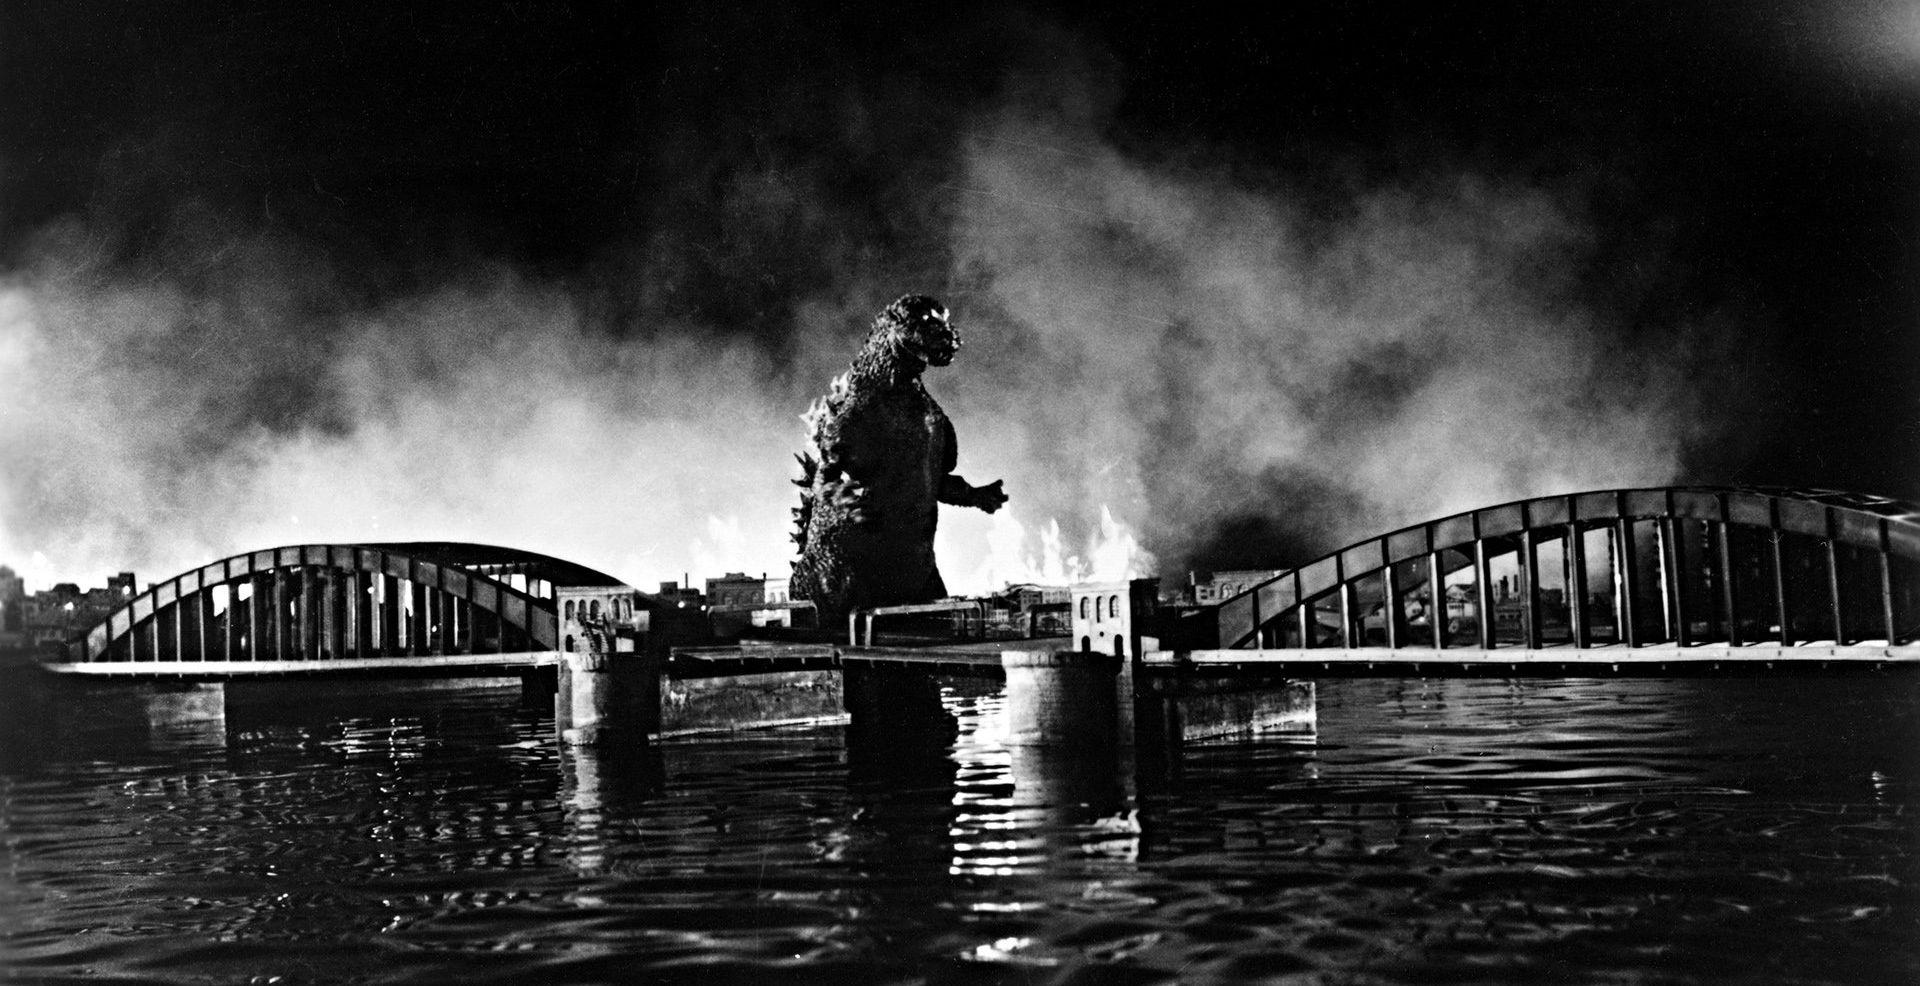 Filmszene aus Godzilla (1954)